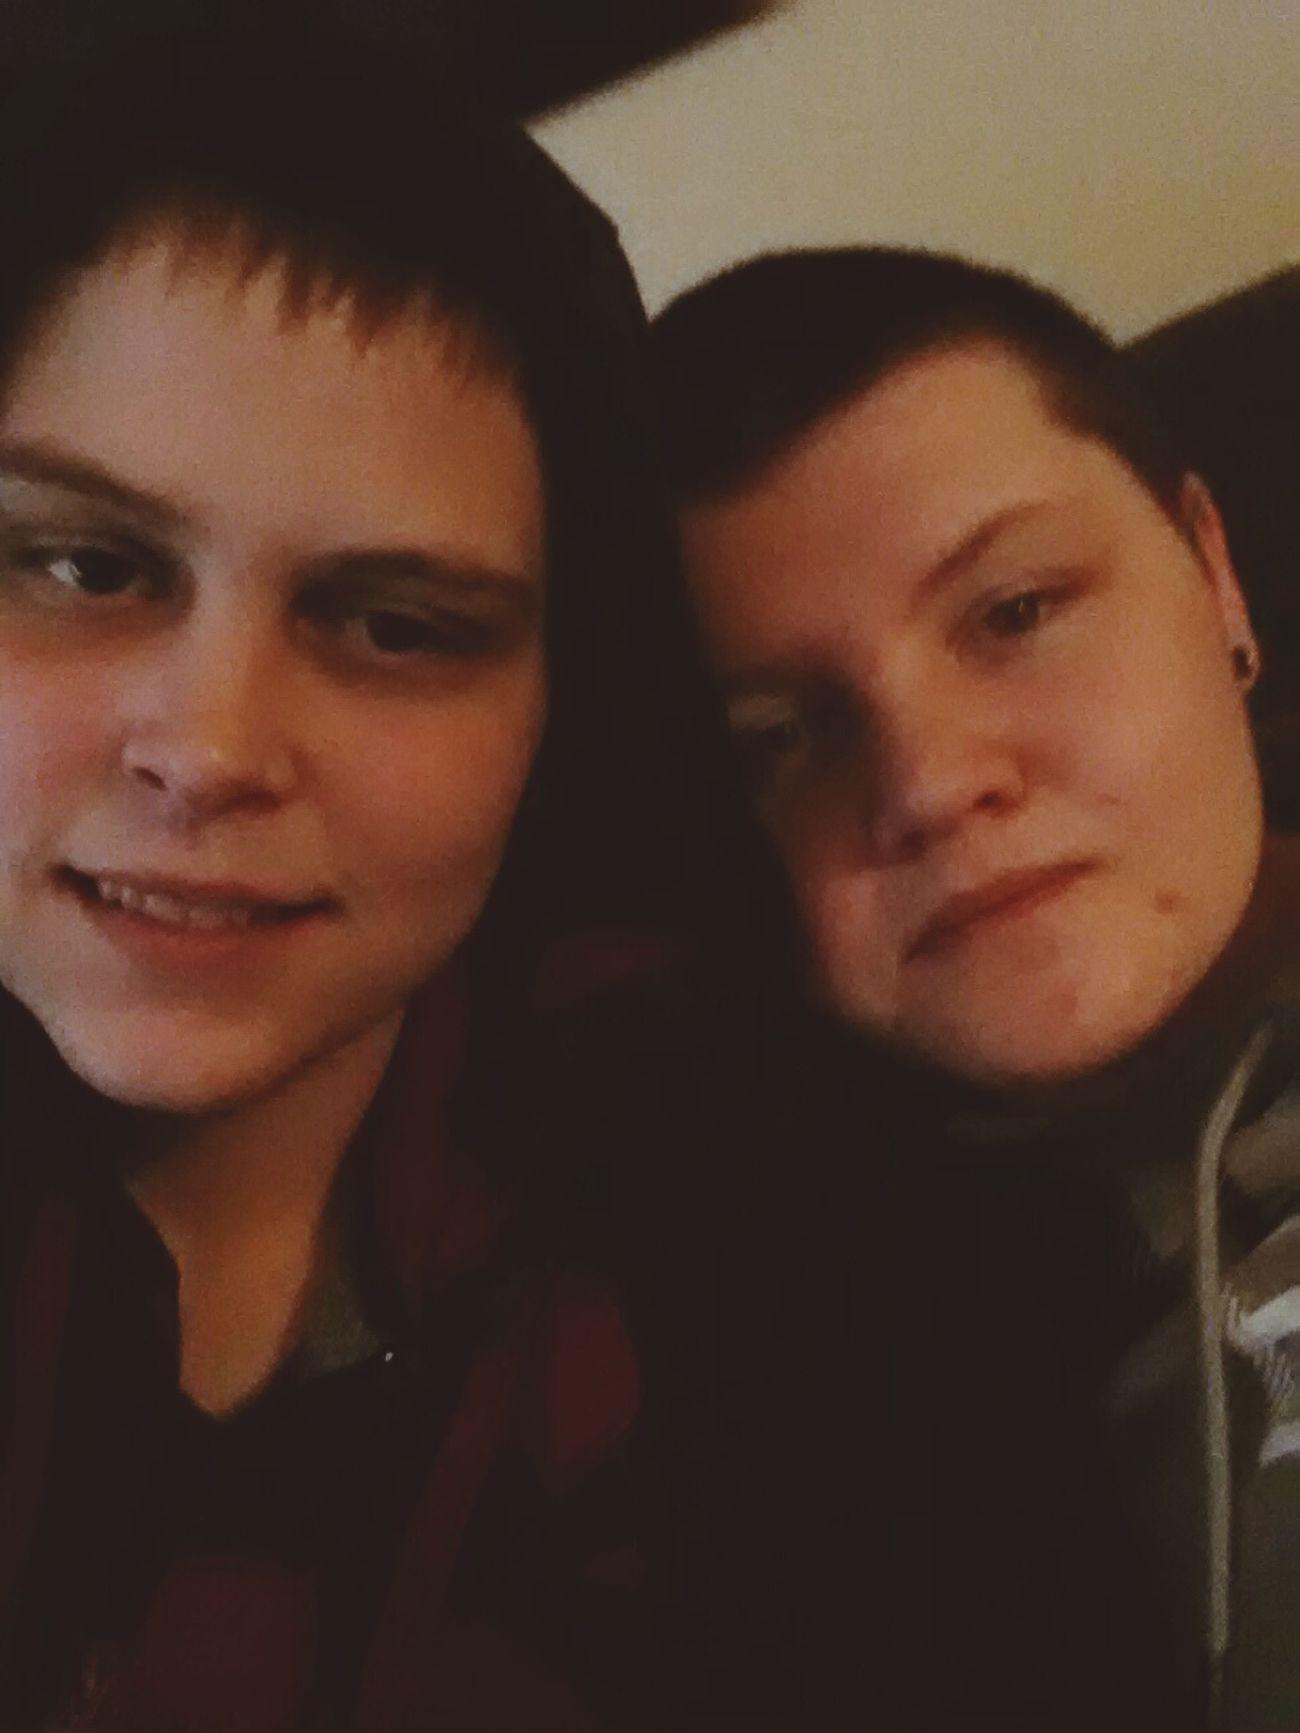 Lesbian Lesbians Lgbt Love Soonmarried